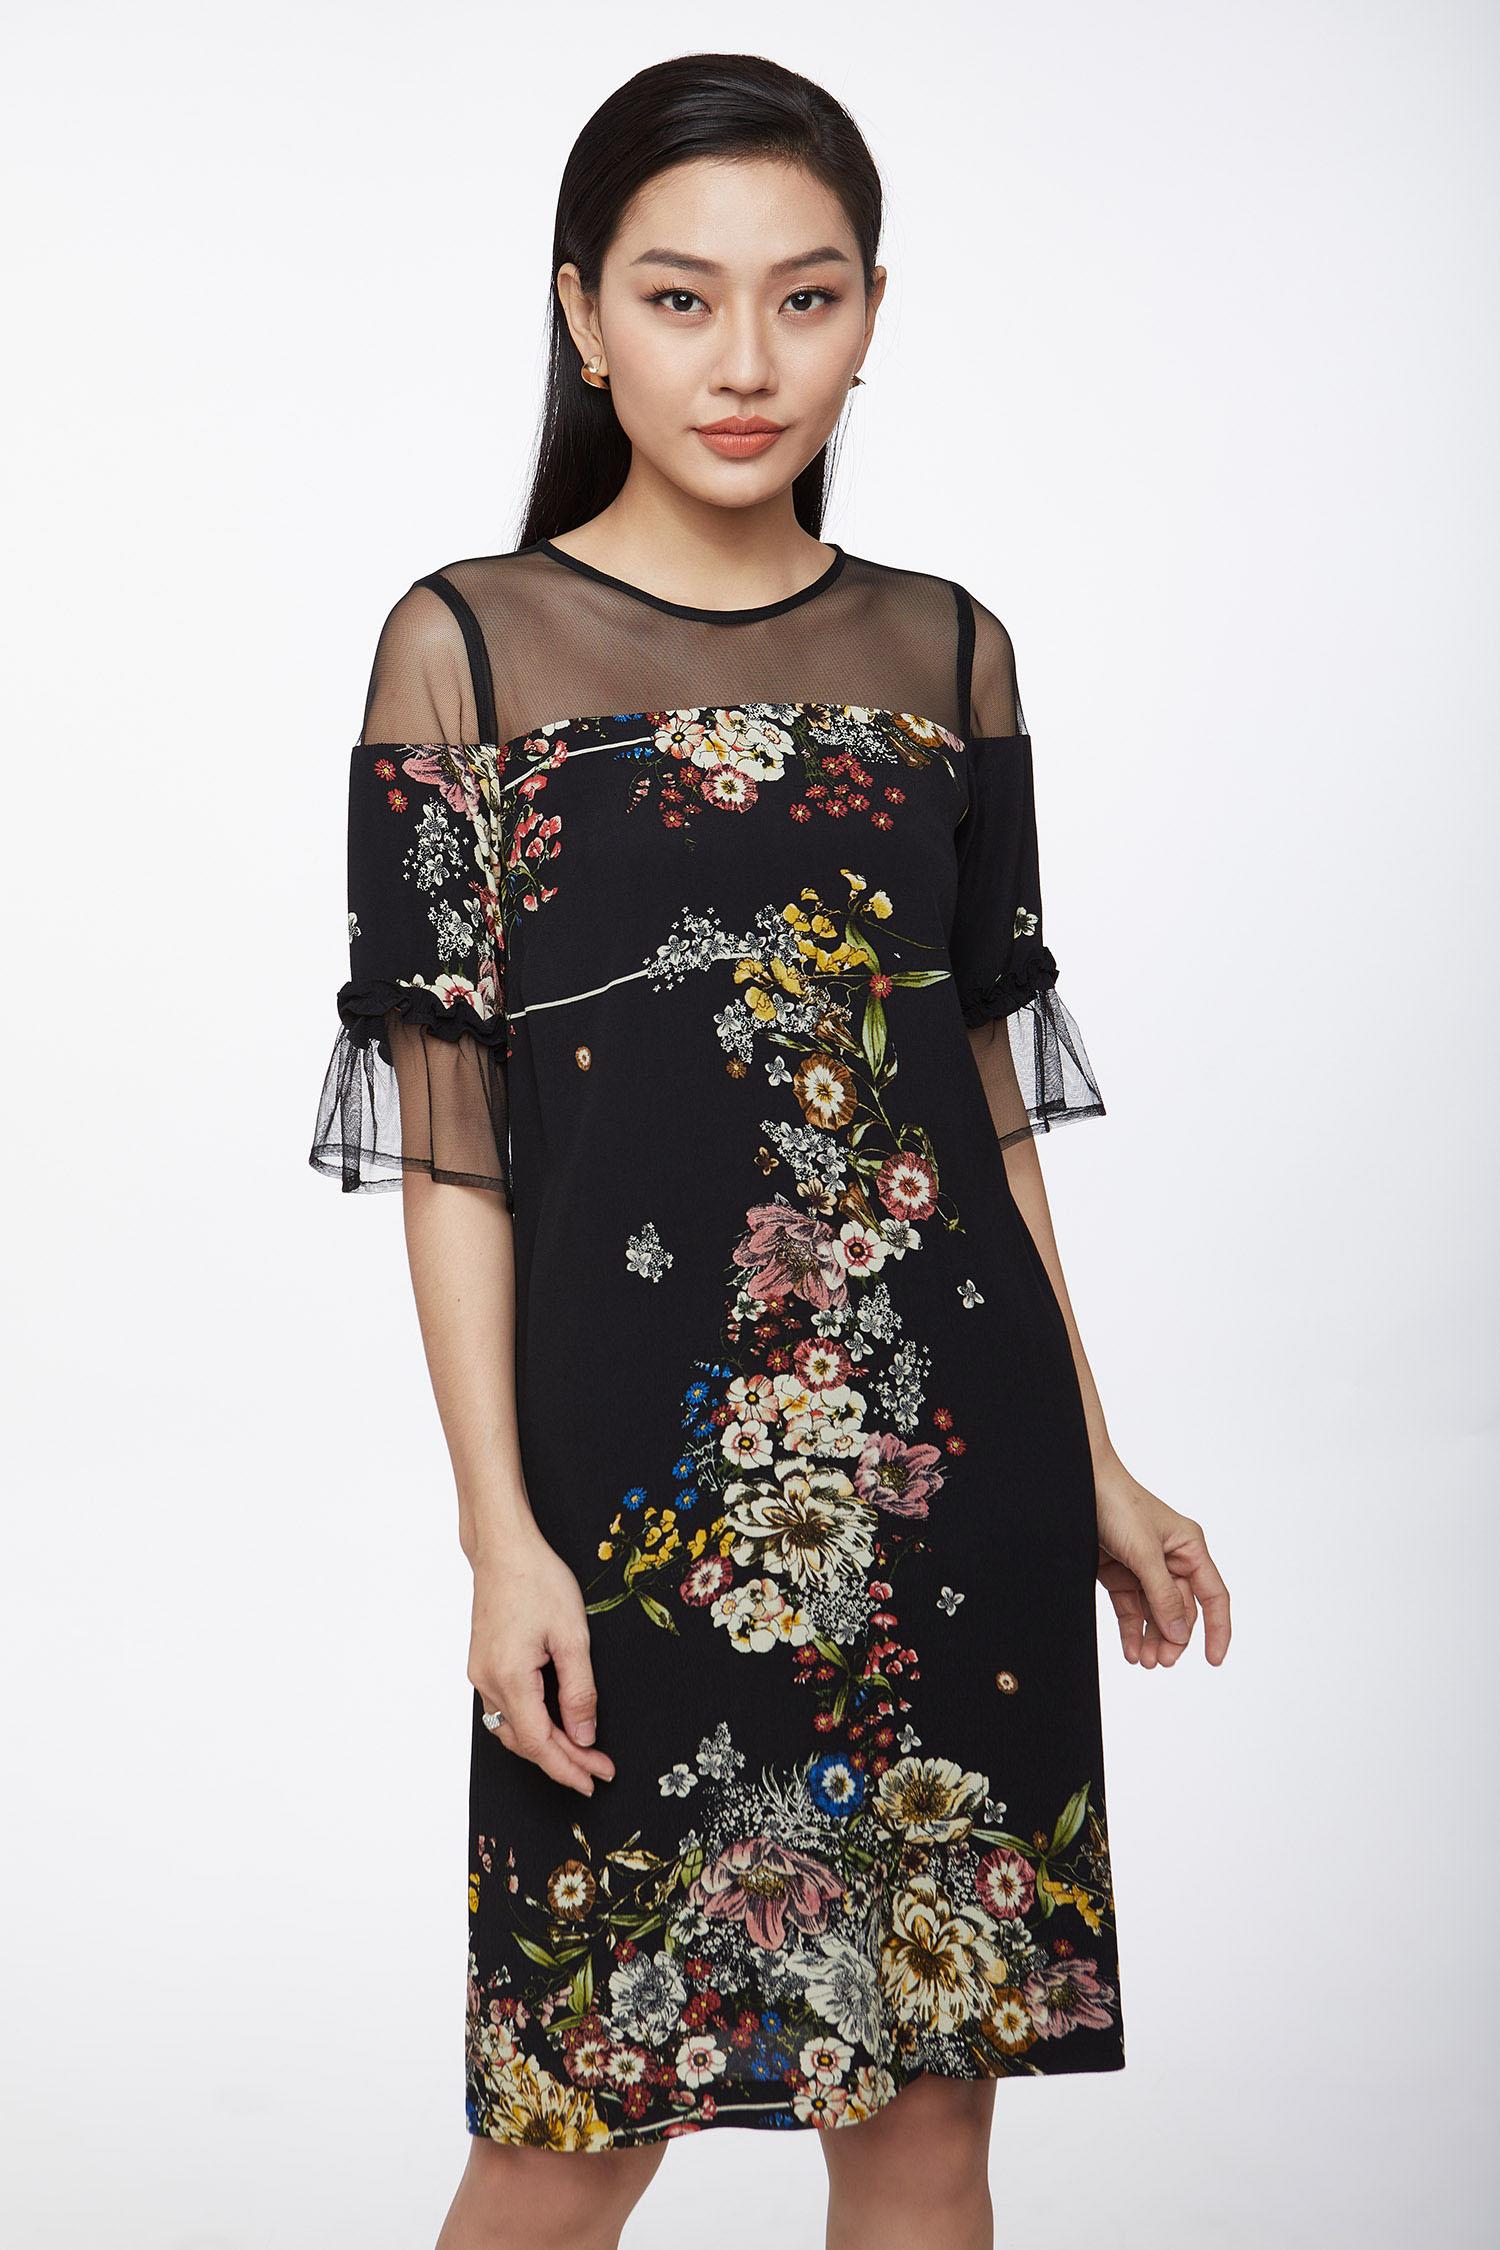 Đầm nữ - 1905111